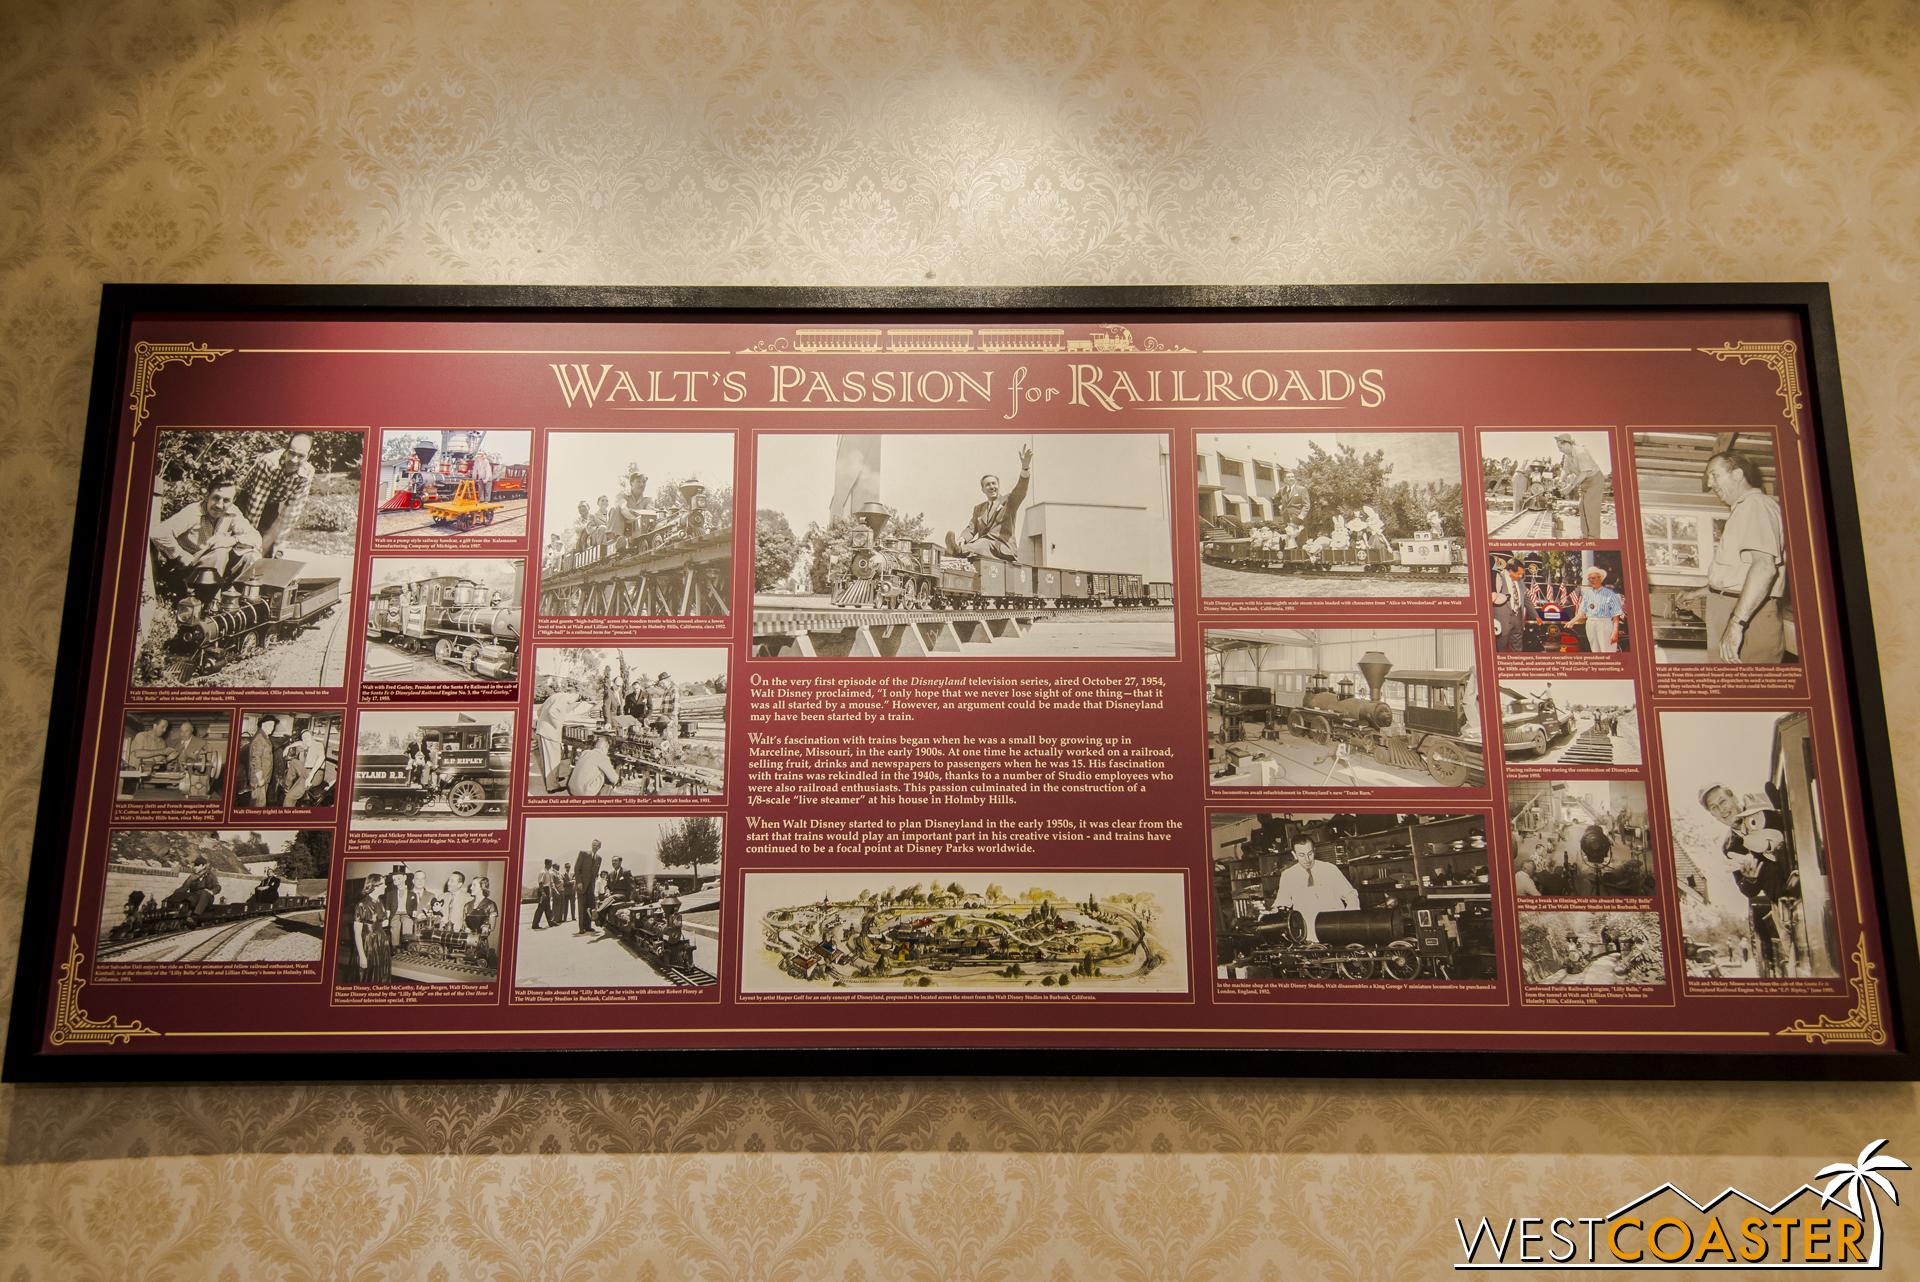 Walt sure loved his trains!